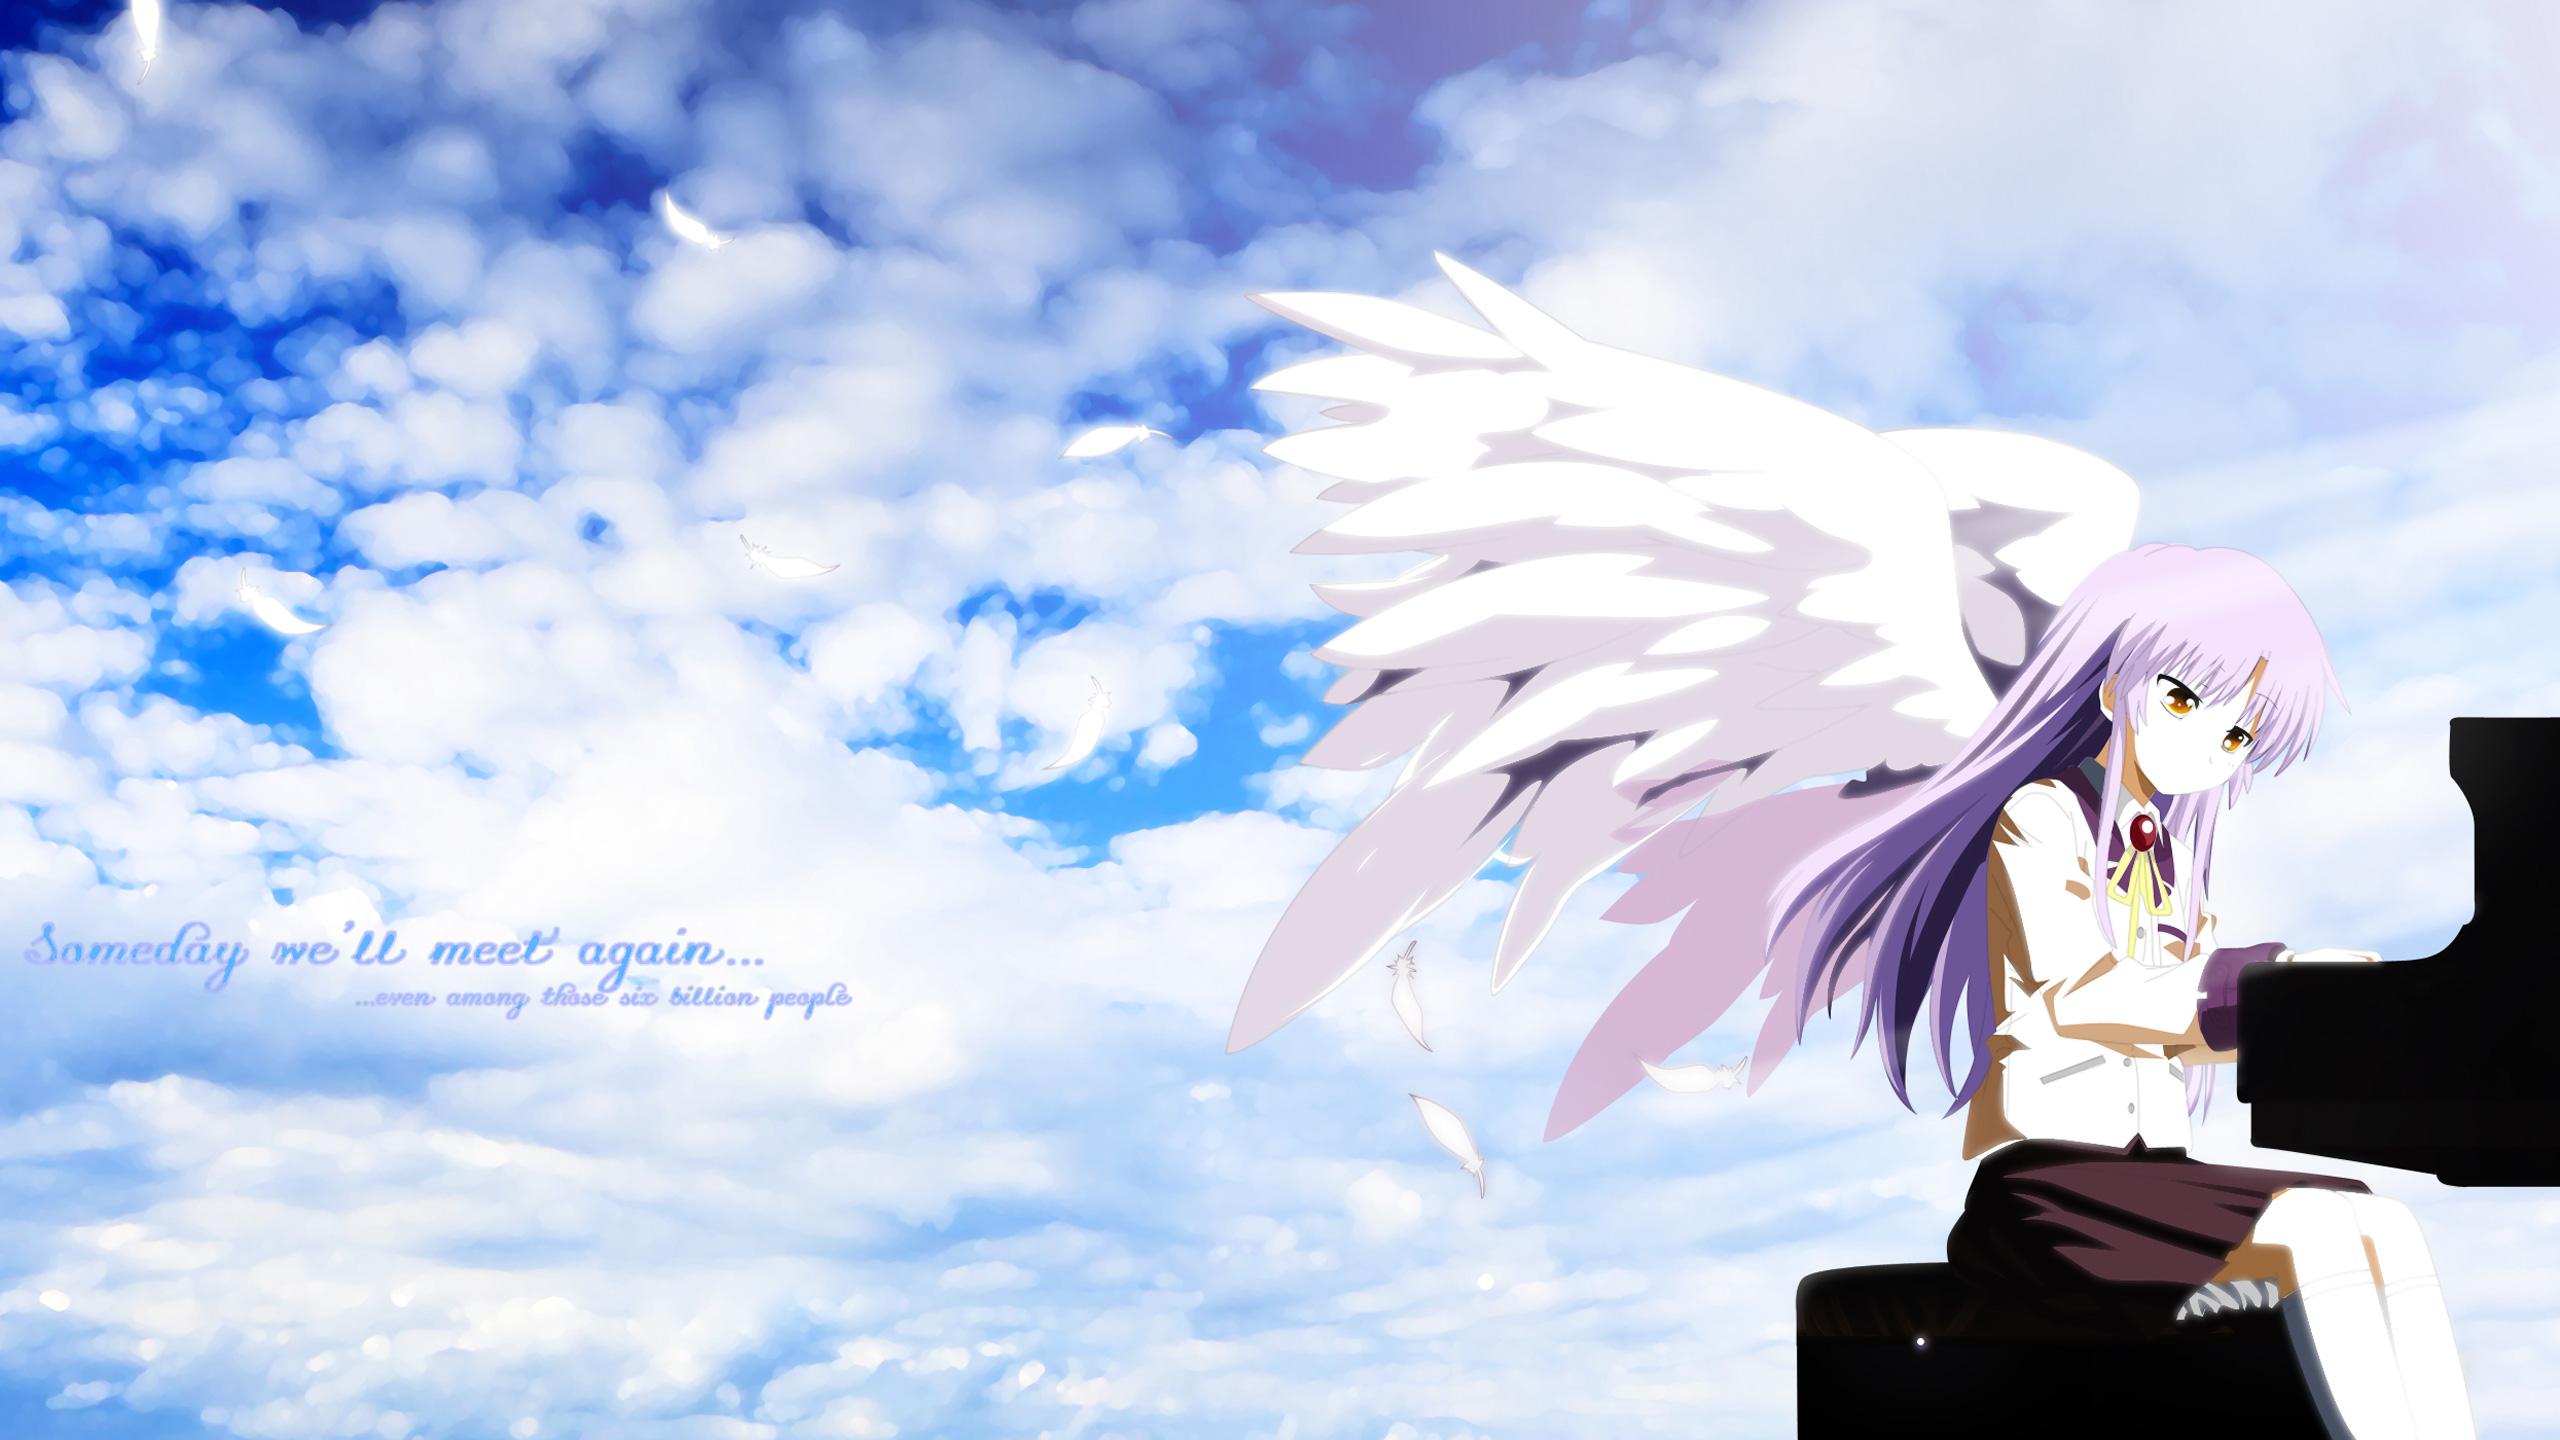 Angel Beats HD Wallpaper Background Image 2560x1440